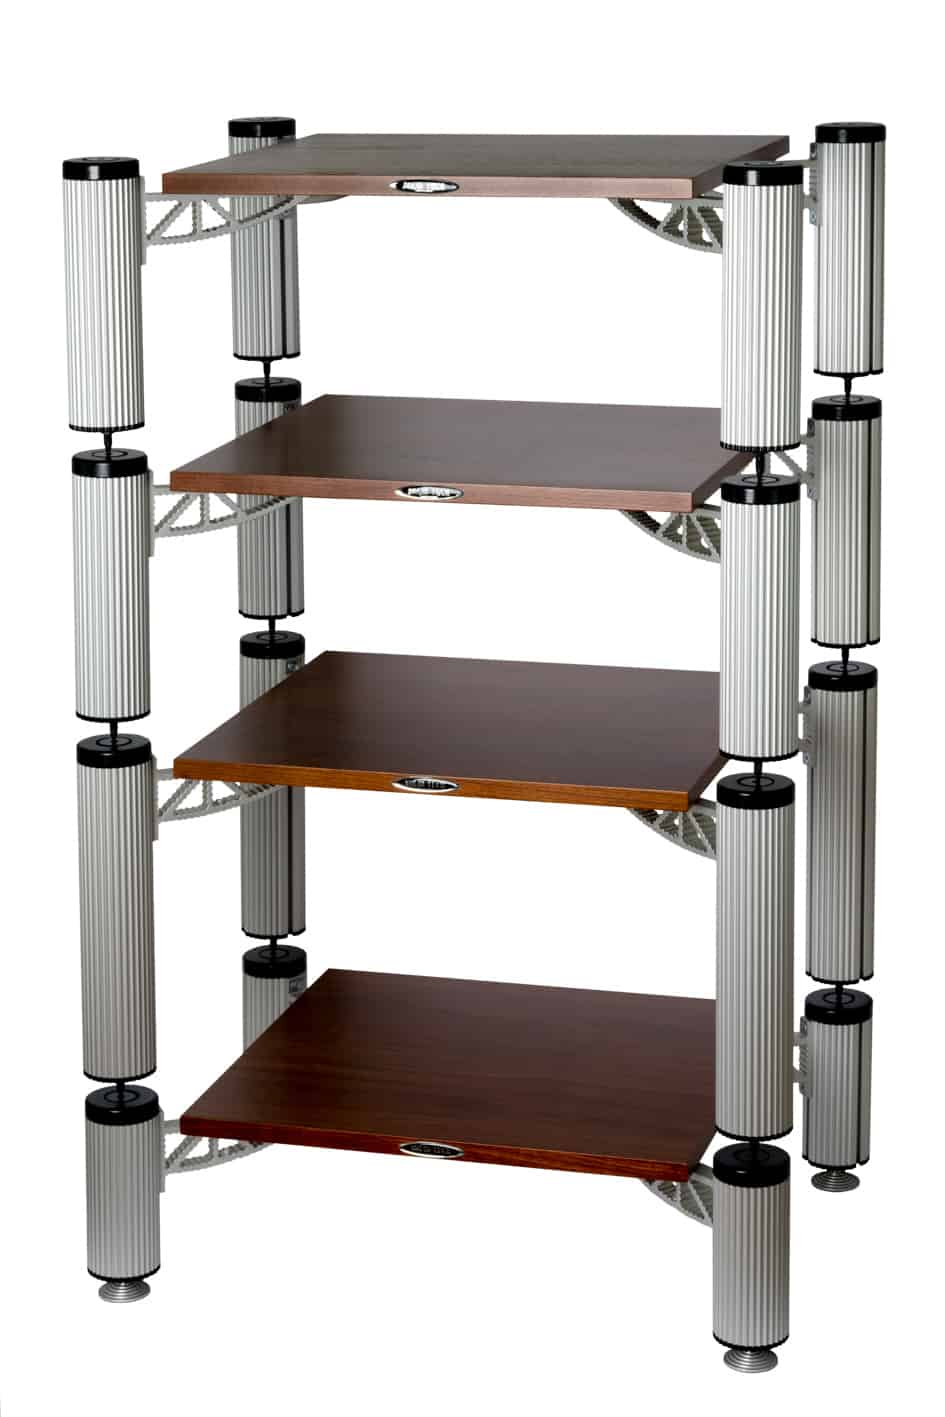 Hybrid Rack With Shelves in Walnut Image